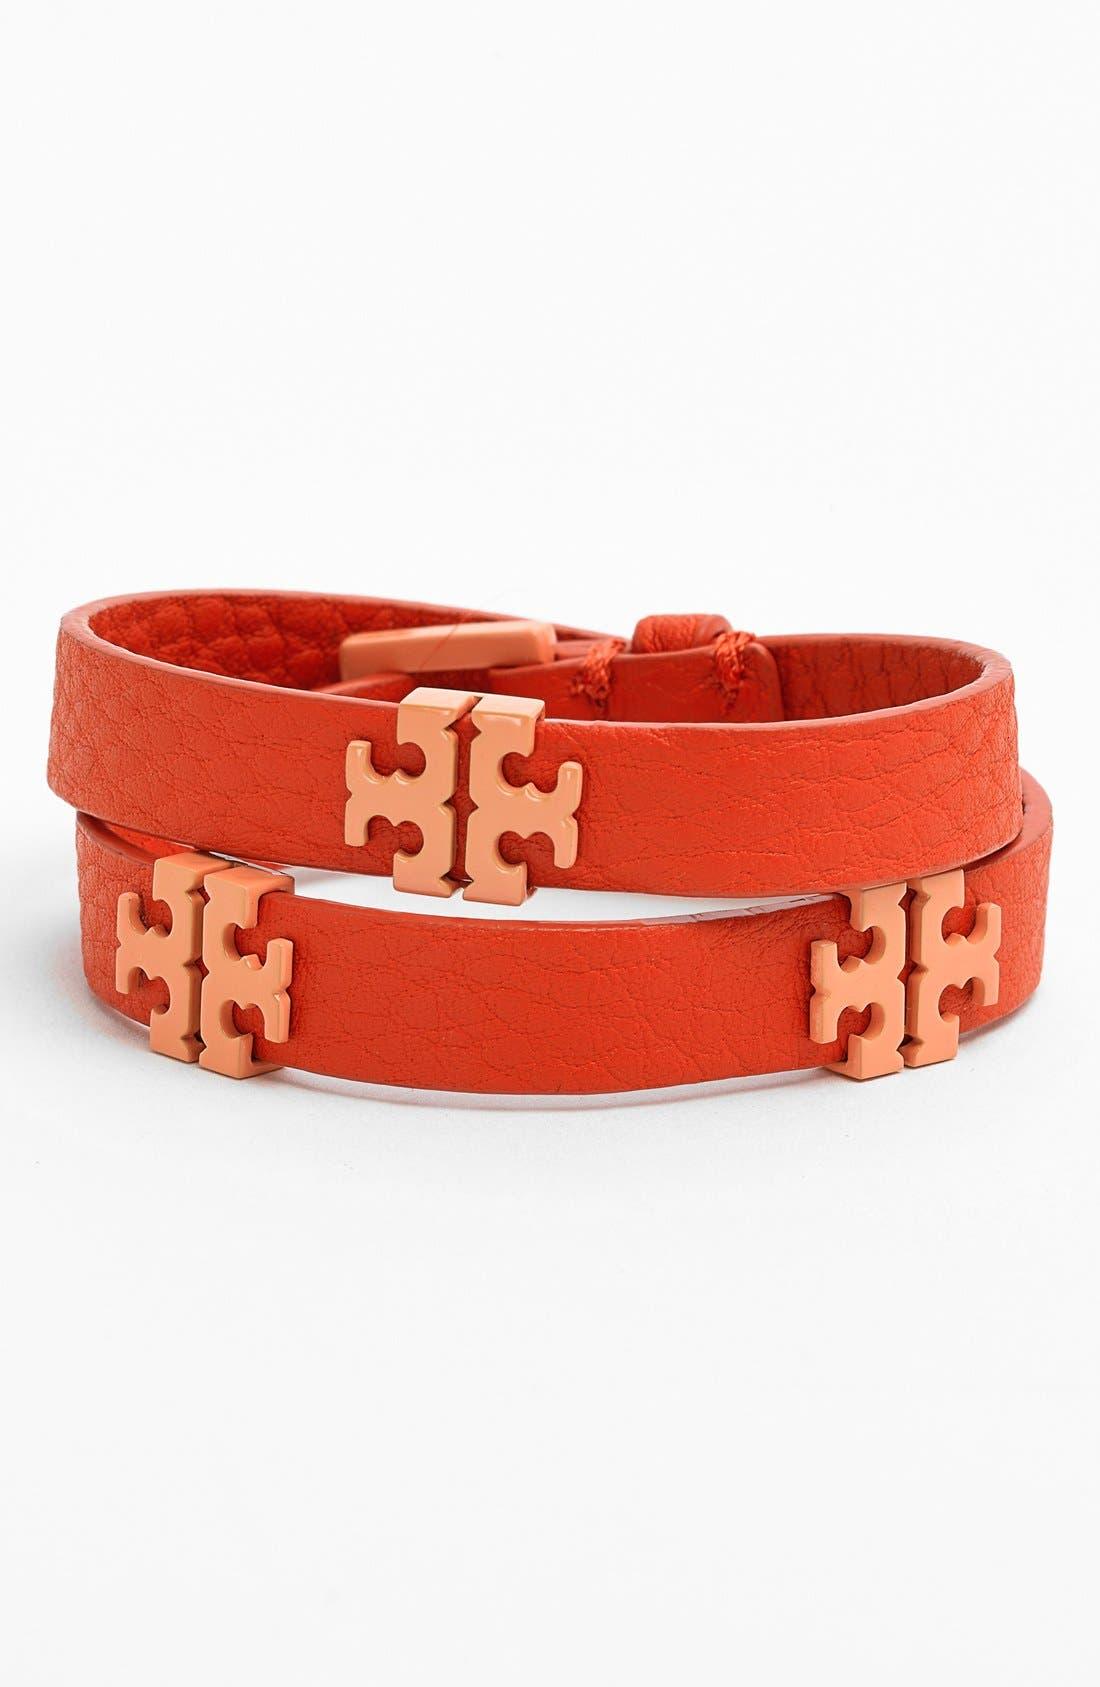 Main Image - Tory Burch 'Mini T' Leather Wrap Bracelet